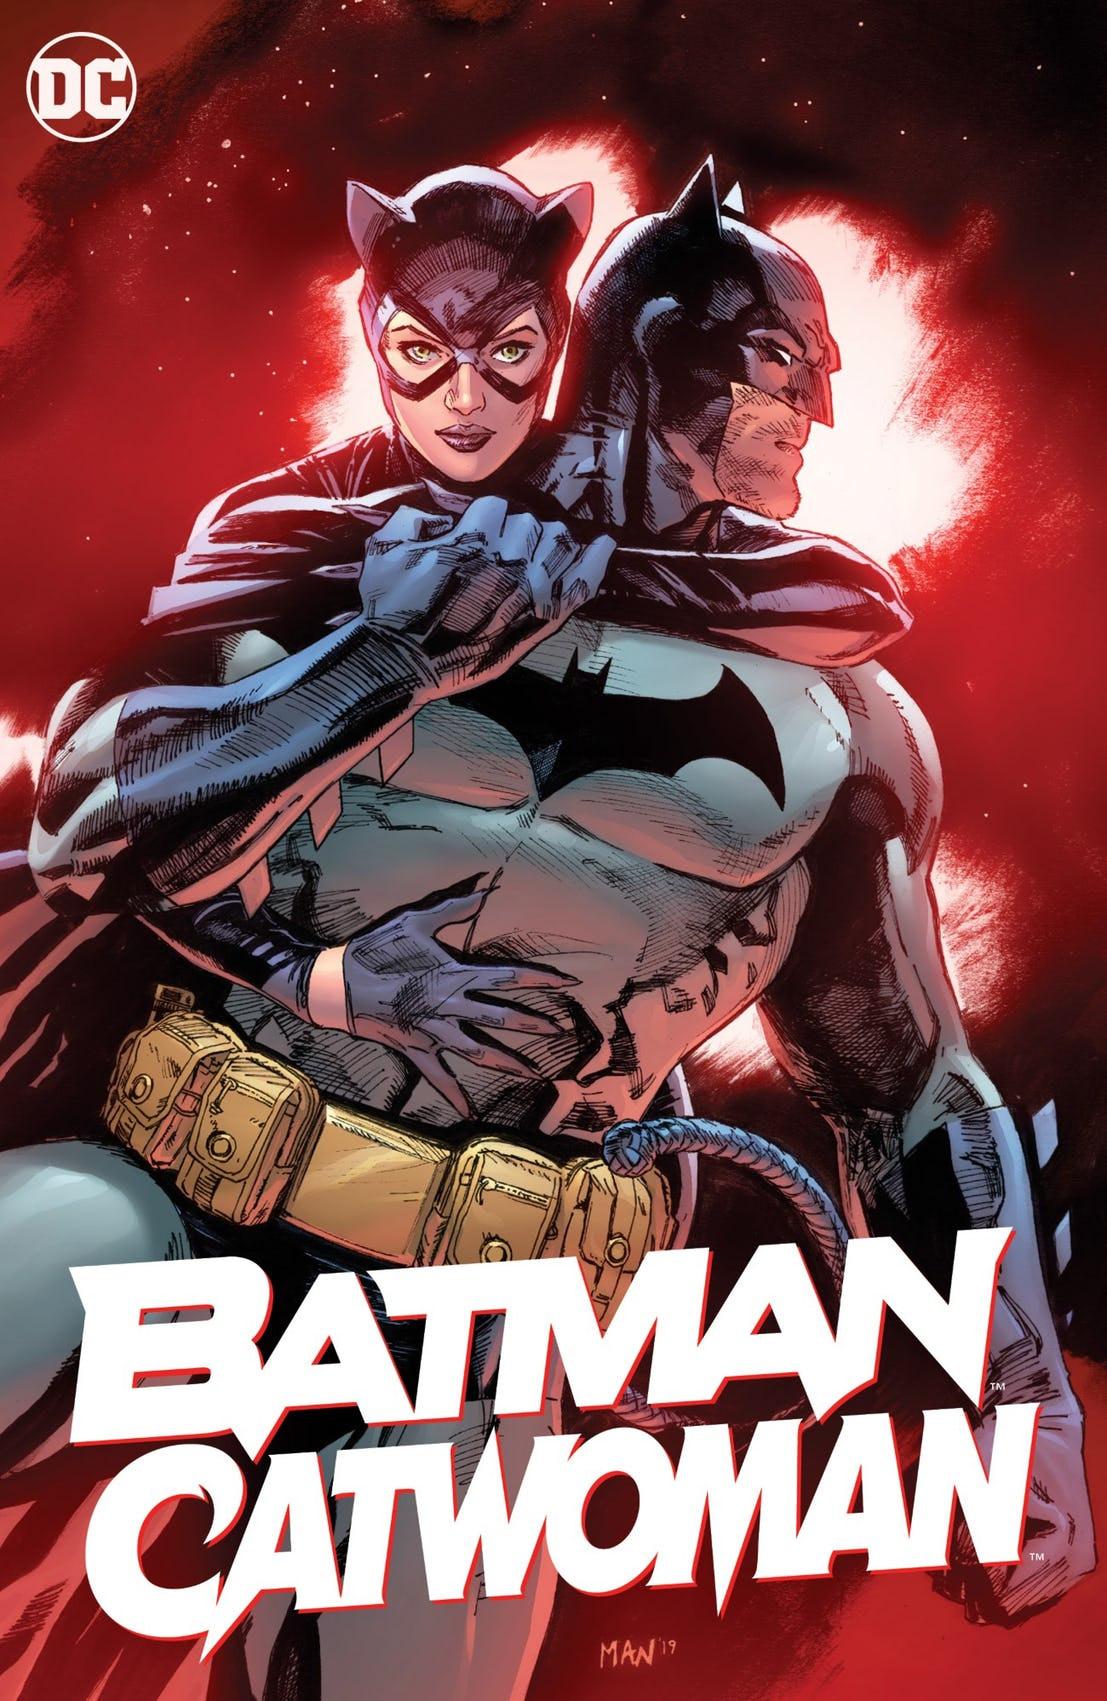 Batman-Catwoman-New-Comic-Cover.jpg